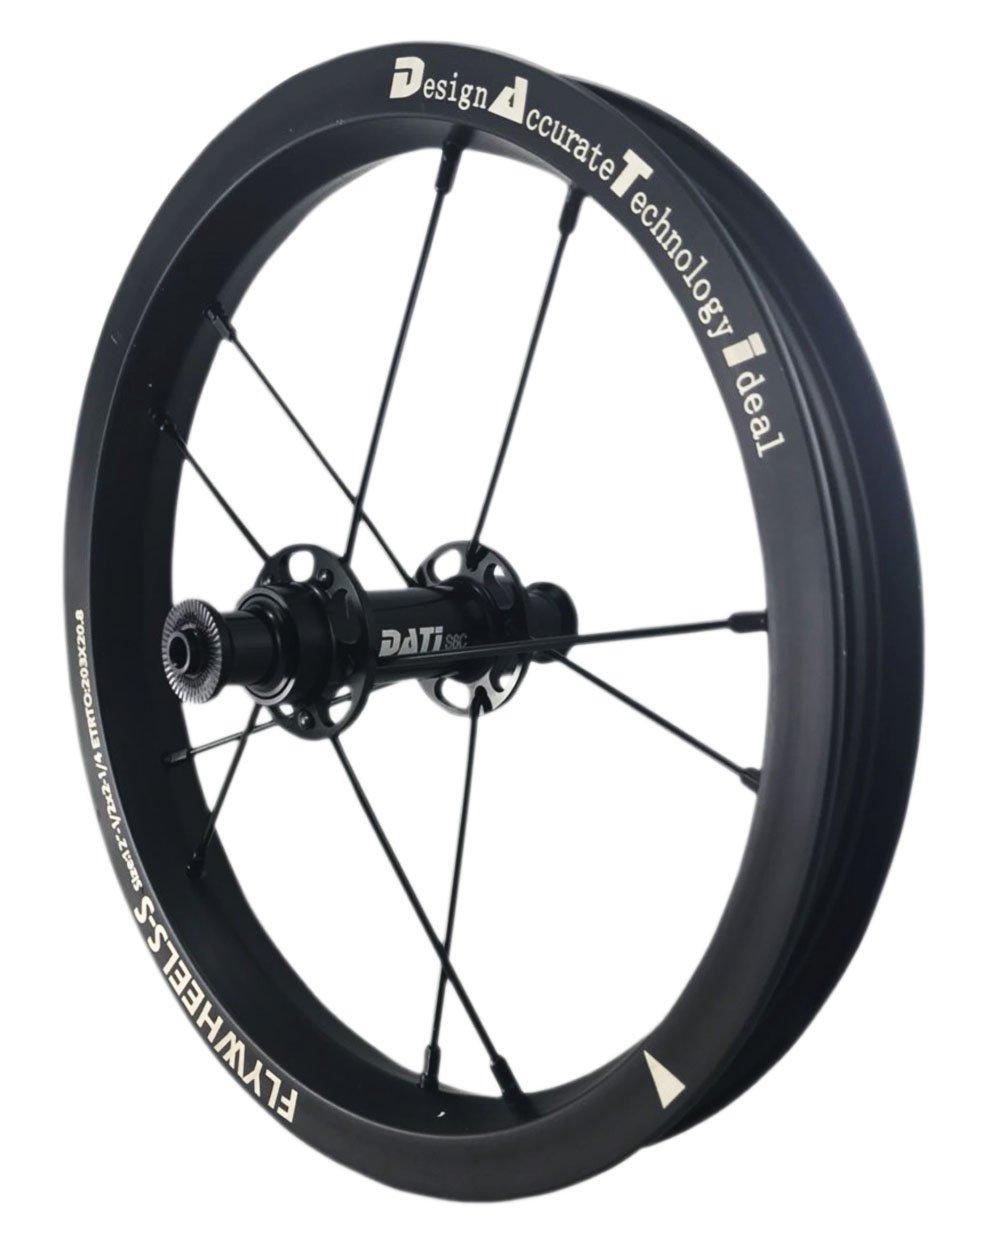 NEW DATI S6C-W AlloyPush Kids Balance Bike Bicycle Super light wheels Set 12'' F+R (Blake, 90X10mm for(Bixbi Puky)) by DATI